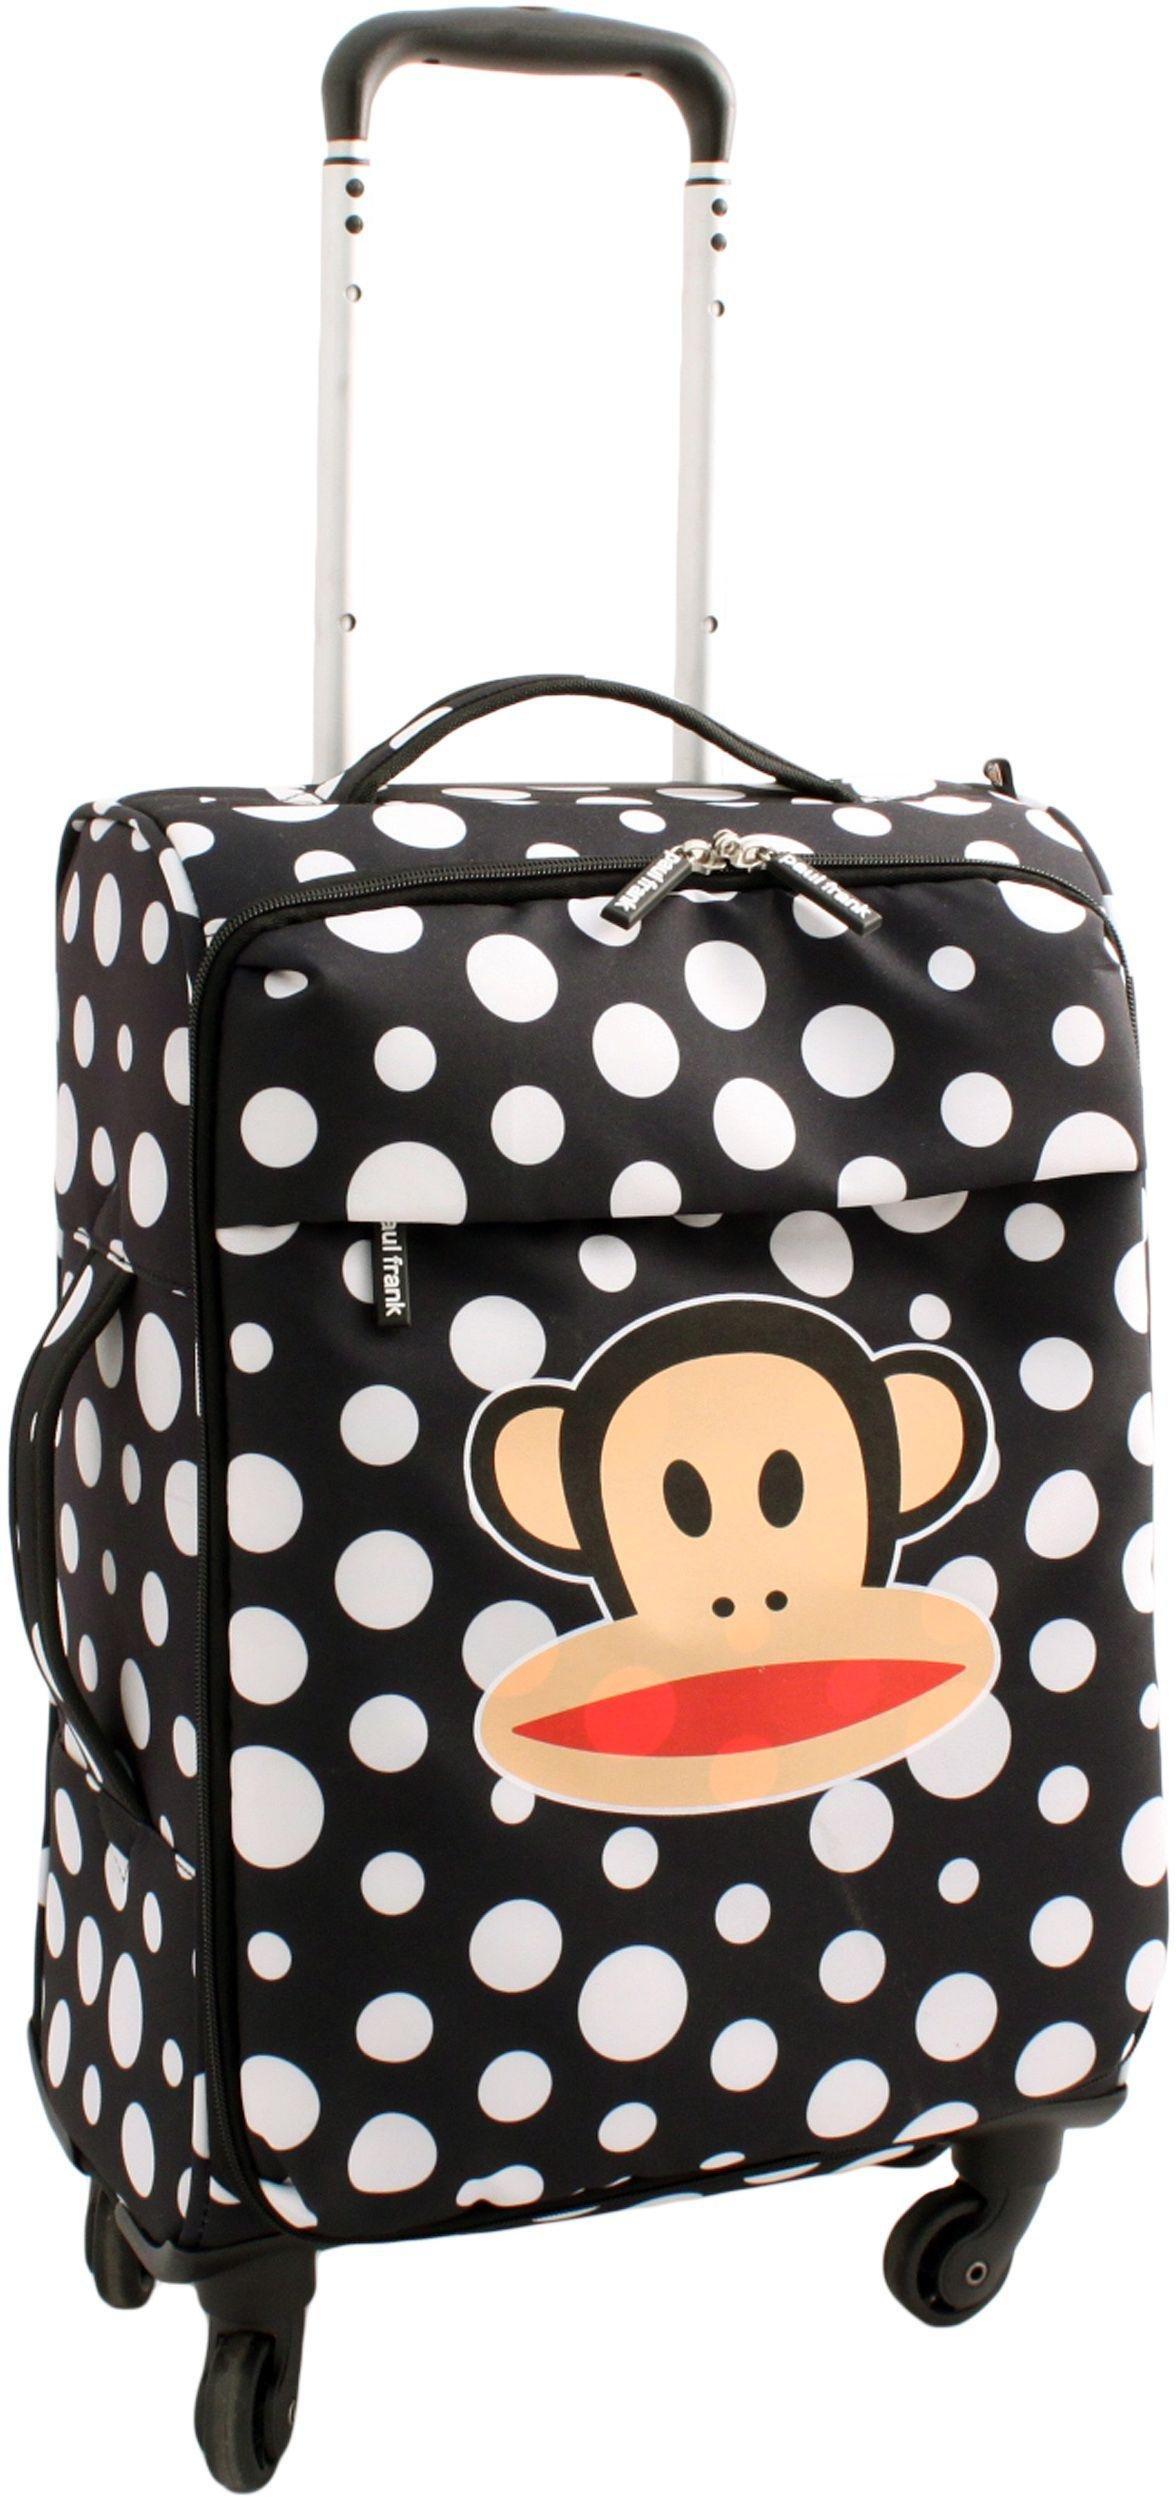 'Paul Frank Julius Monkey Large 4 Wheel Suitcase - Black